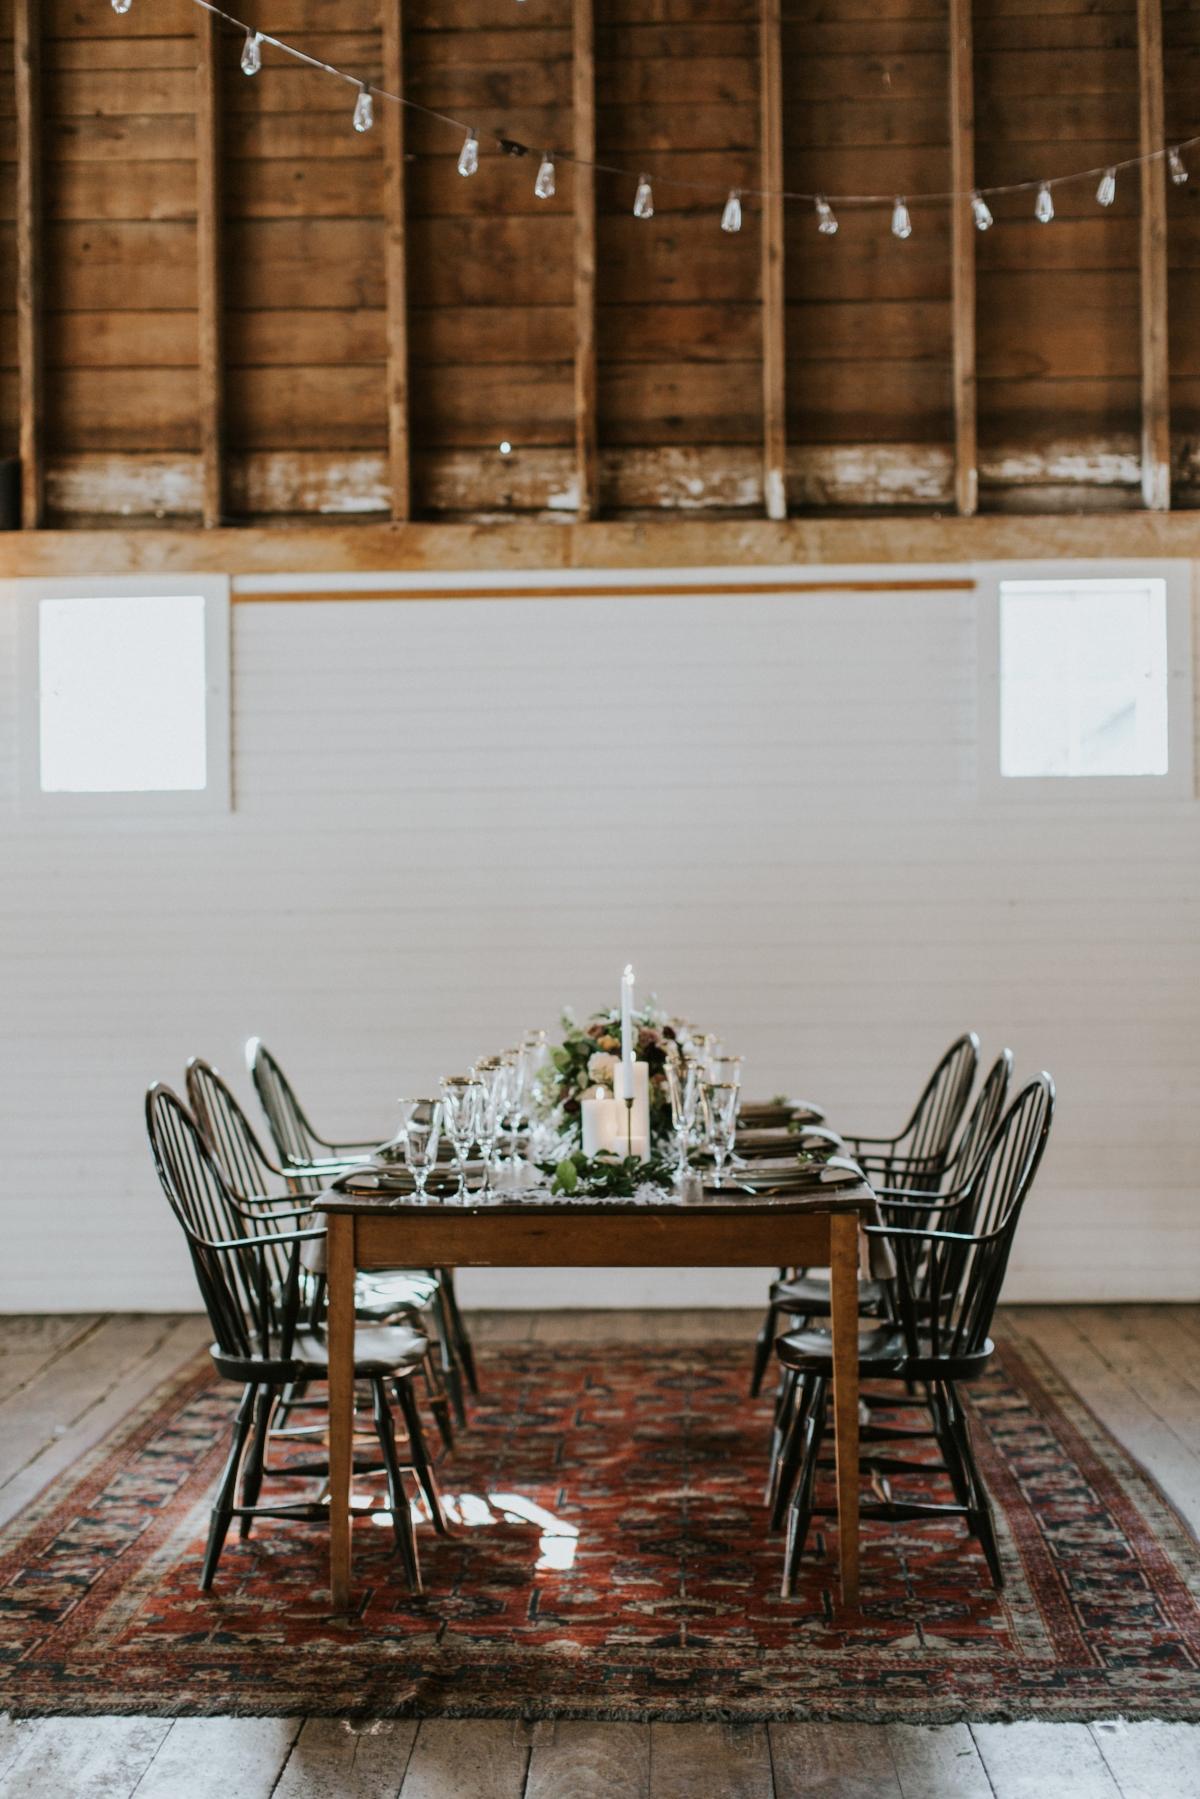 Edera Jewelry Blog: Bohemian & Rustic Wedding Inspiration in Berkshires